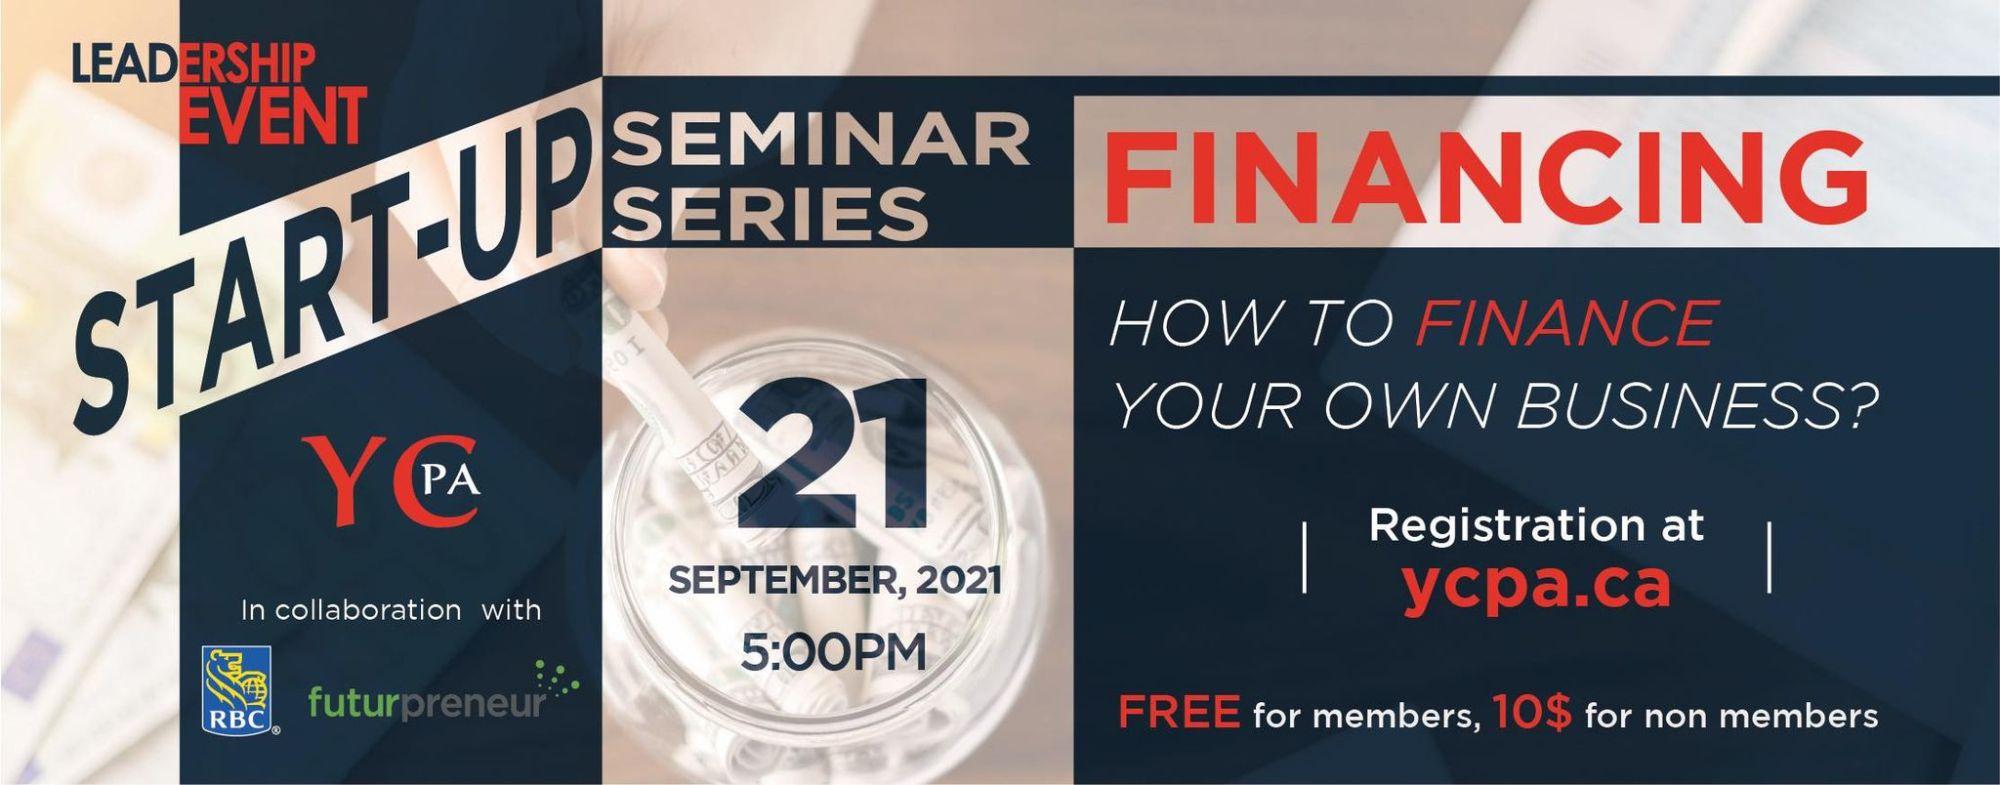 Leadership Event - Startup Seminar Series - Financing